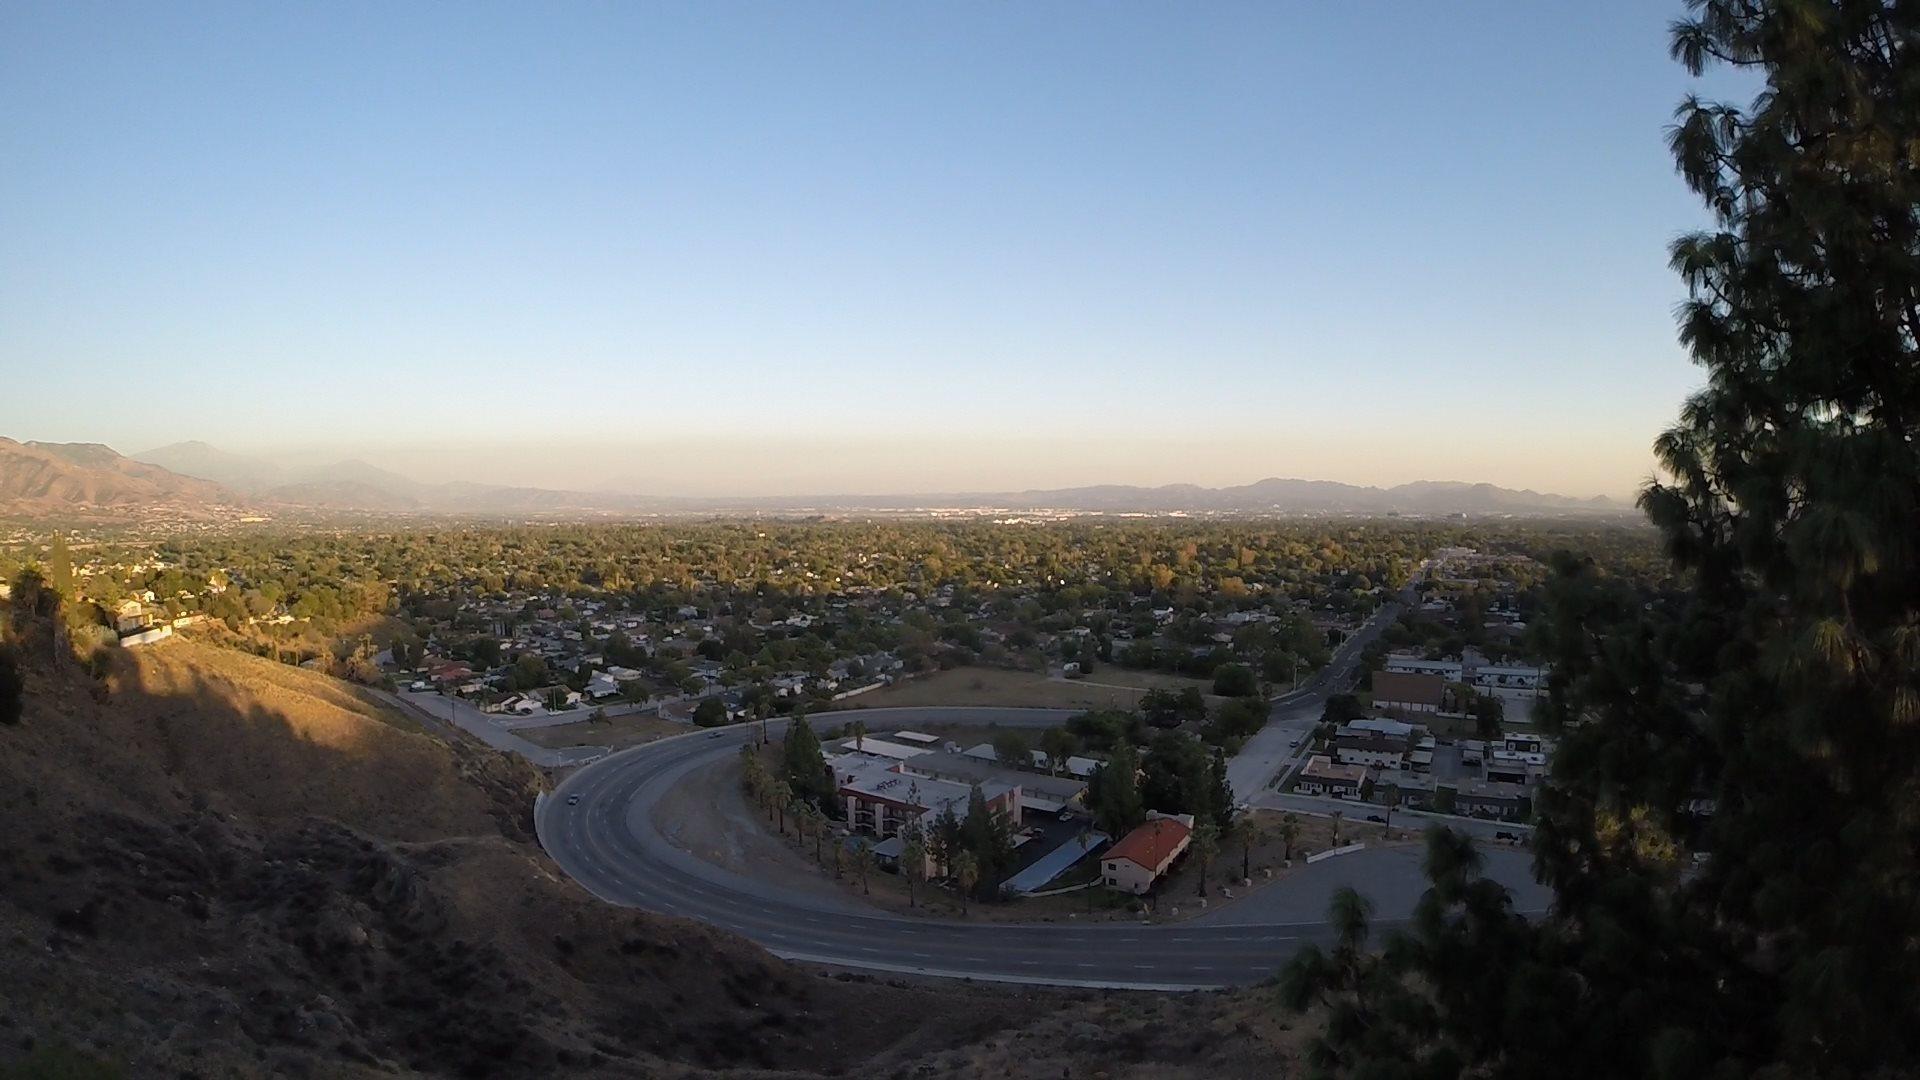 Castaway San Bernadino